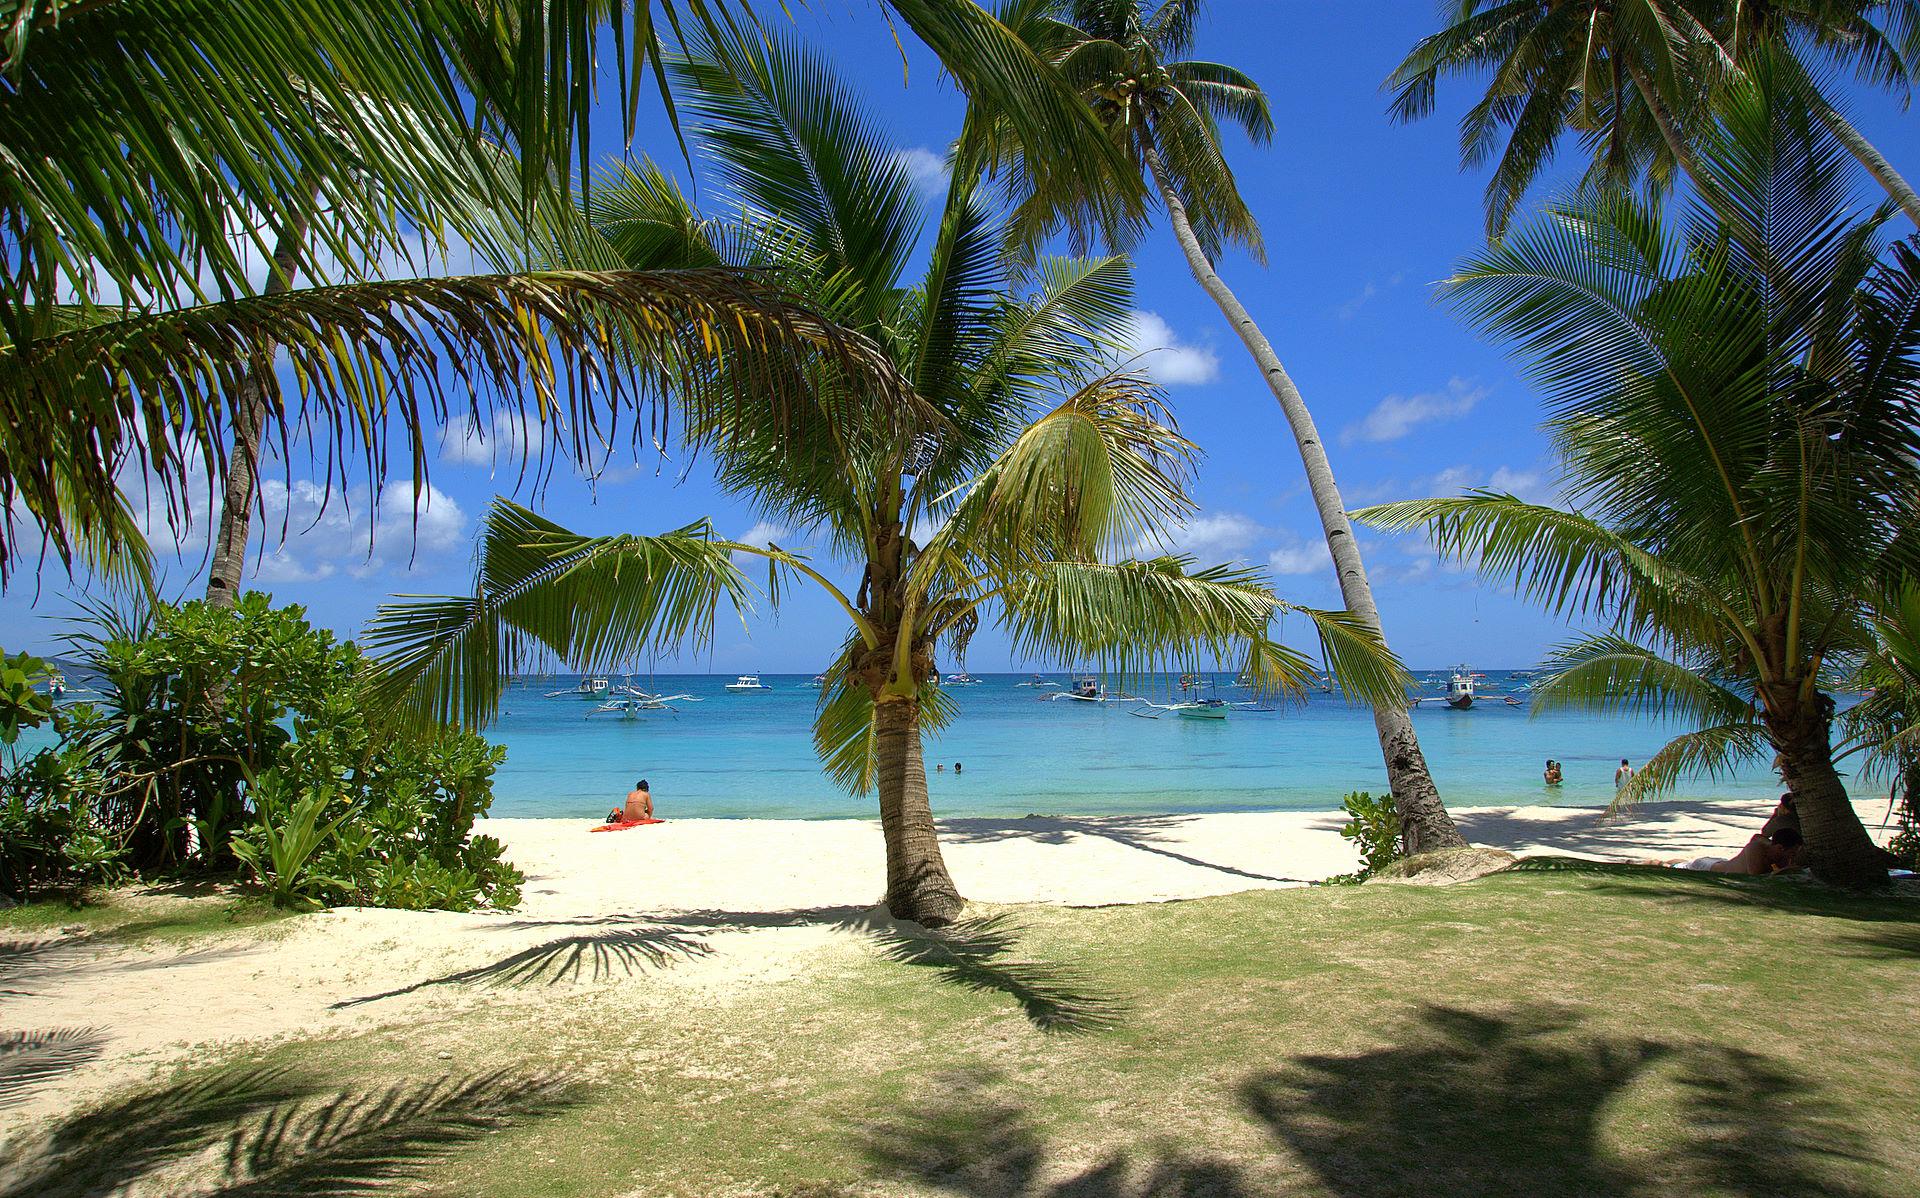 Beautiful Tropical Islands Desktop Wallpaper 1920x1198